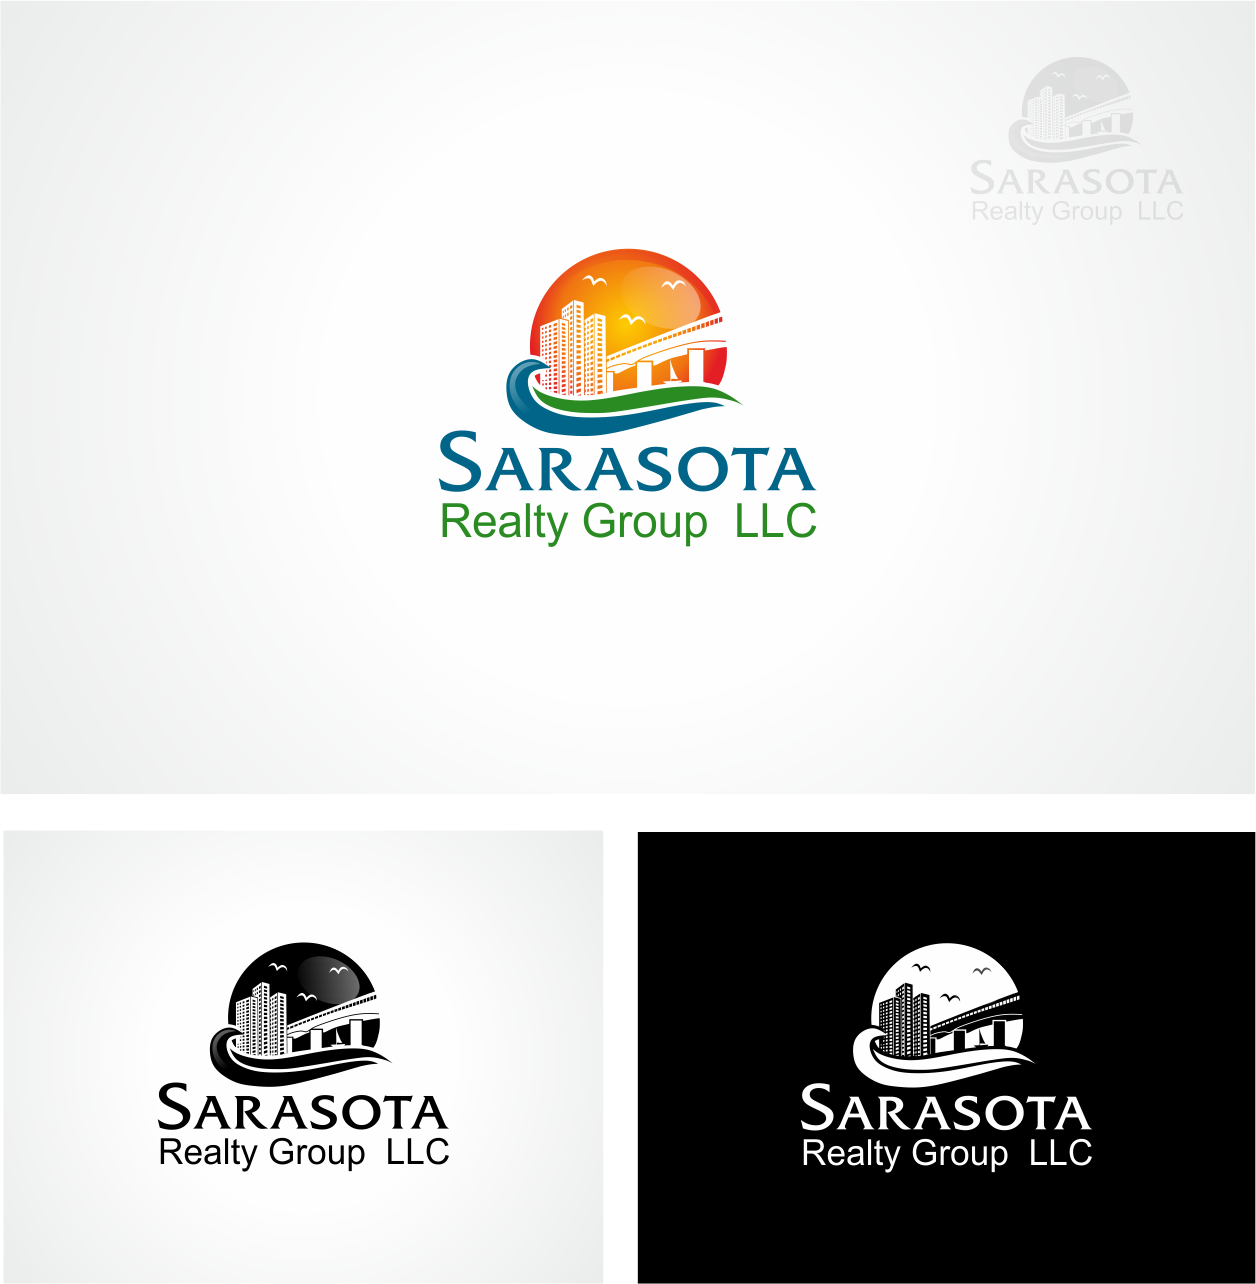 Help Sarasota Realty Group LLC with a new logo